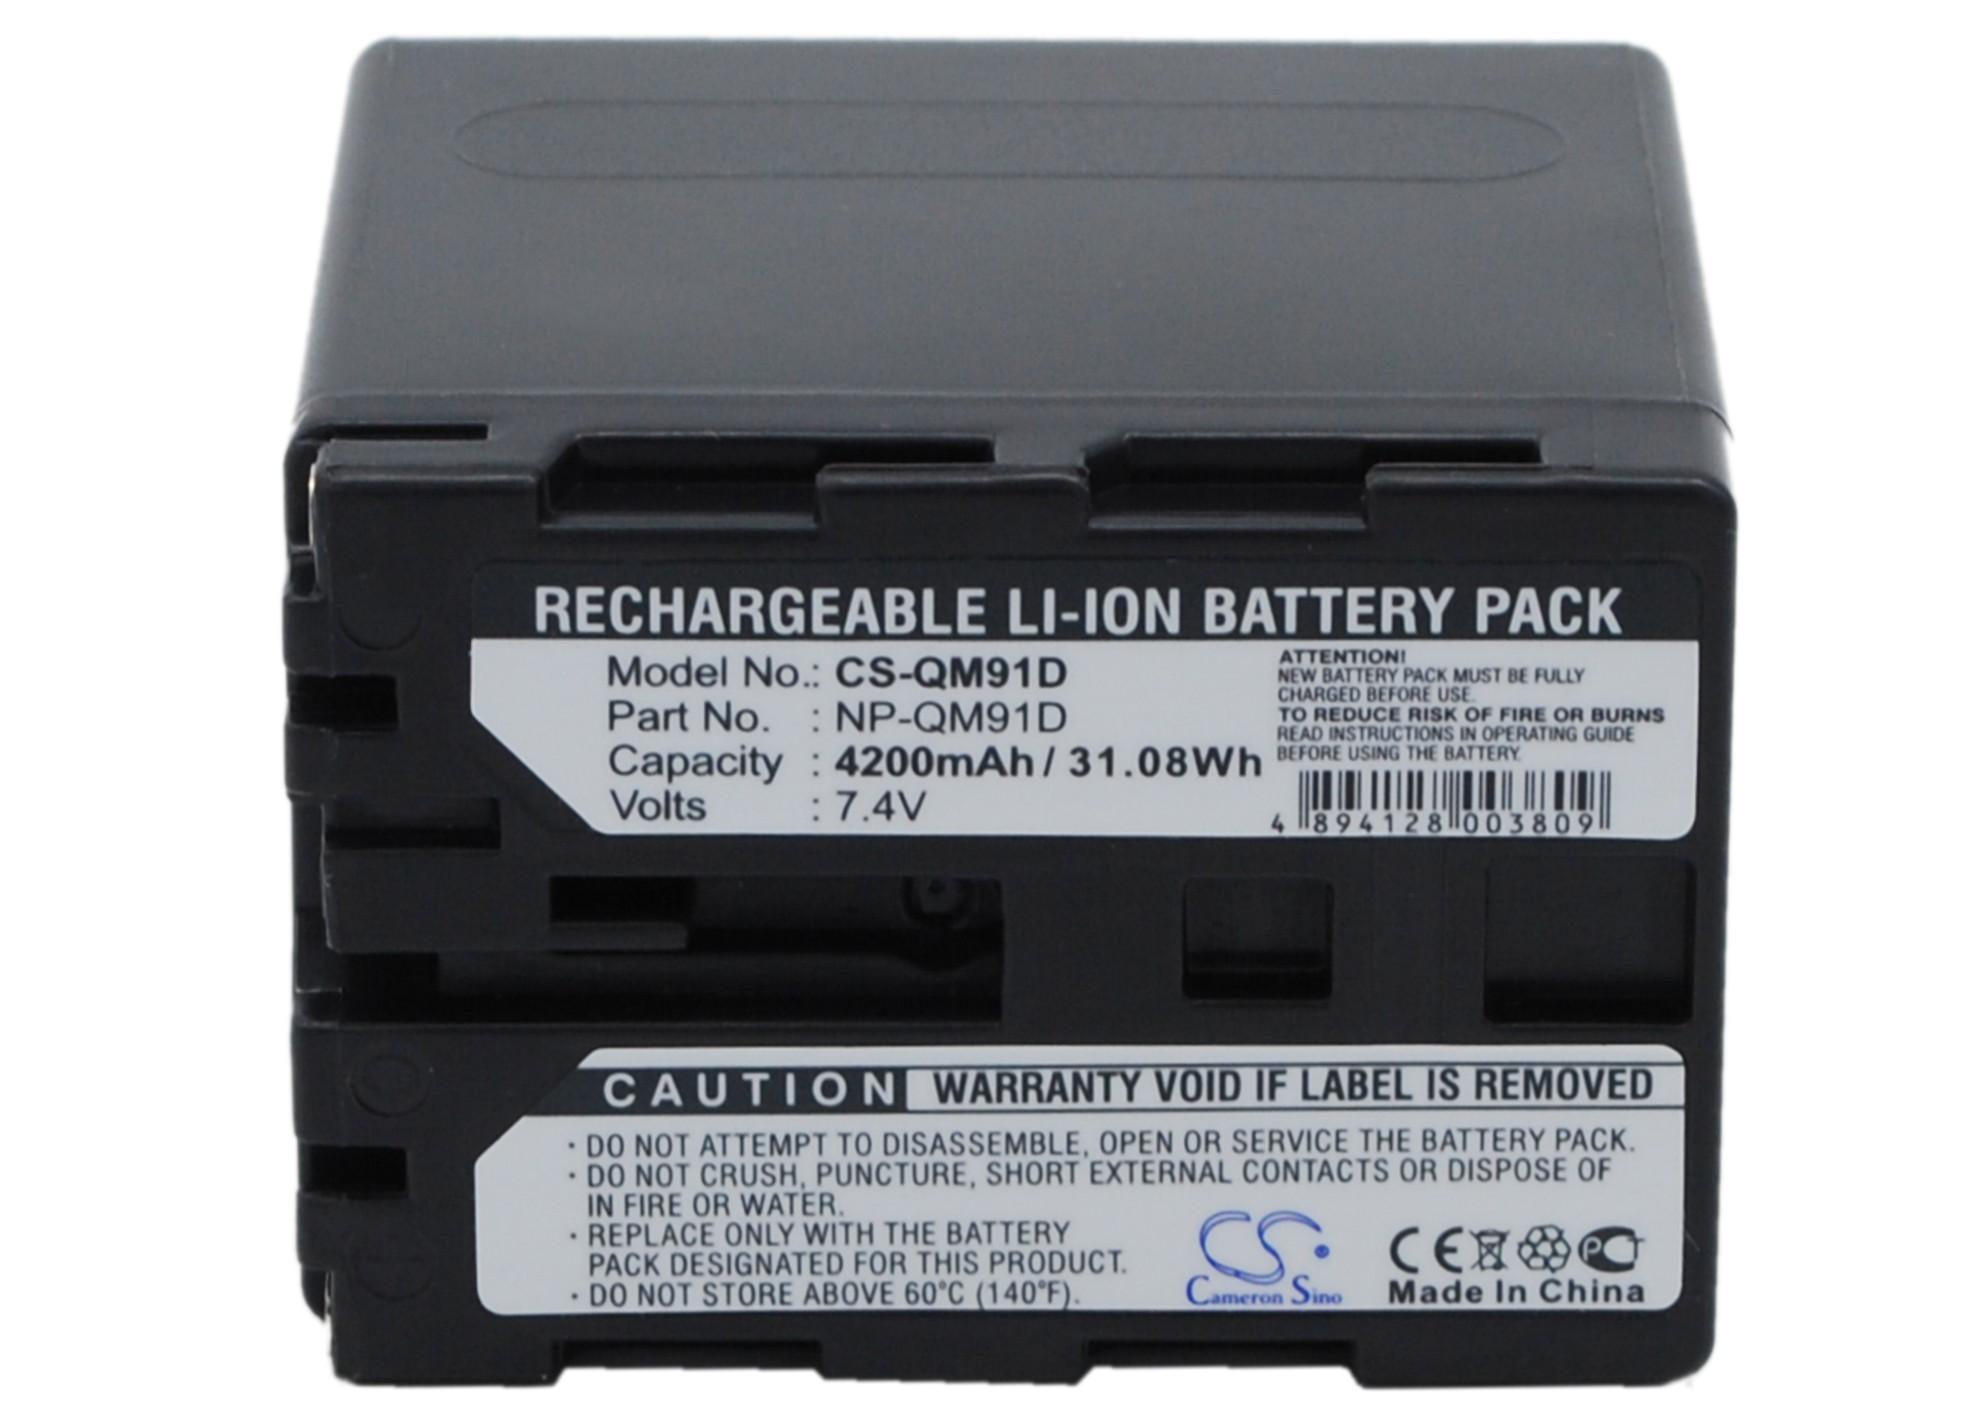 Cameron Sino baterie do kamer a fotoaparátů pro SONY DCR-PC8 7.4V Li-ion 4200mAh tmavě šedá - neoriginální